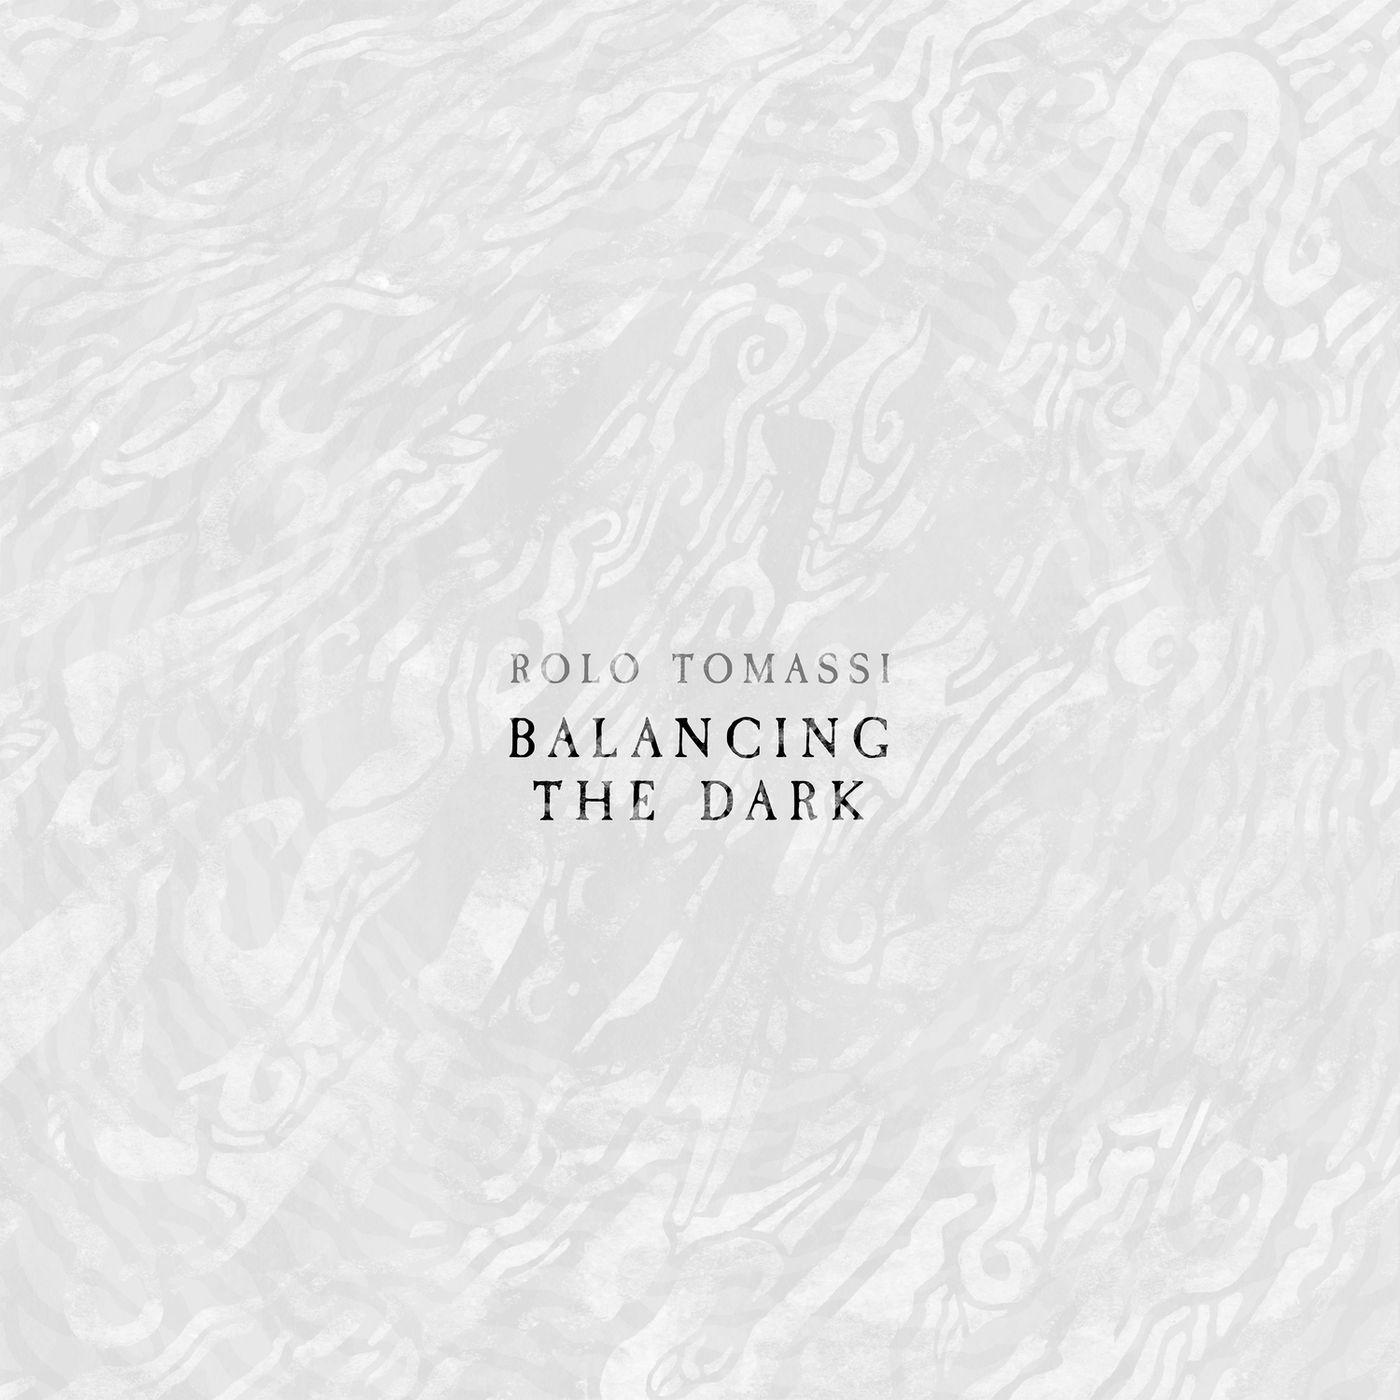 Rolo Tomassi - Balancing the Dark [single] (2017)